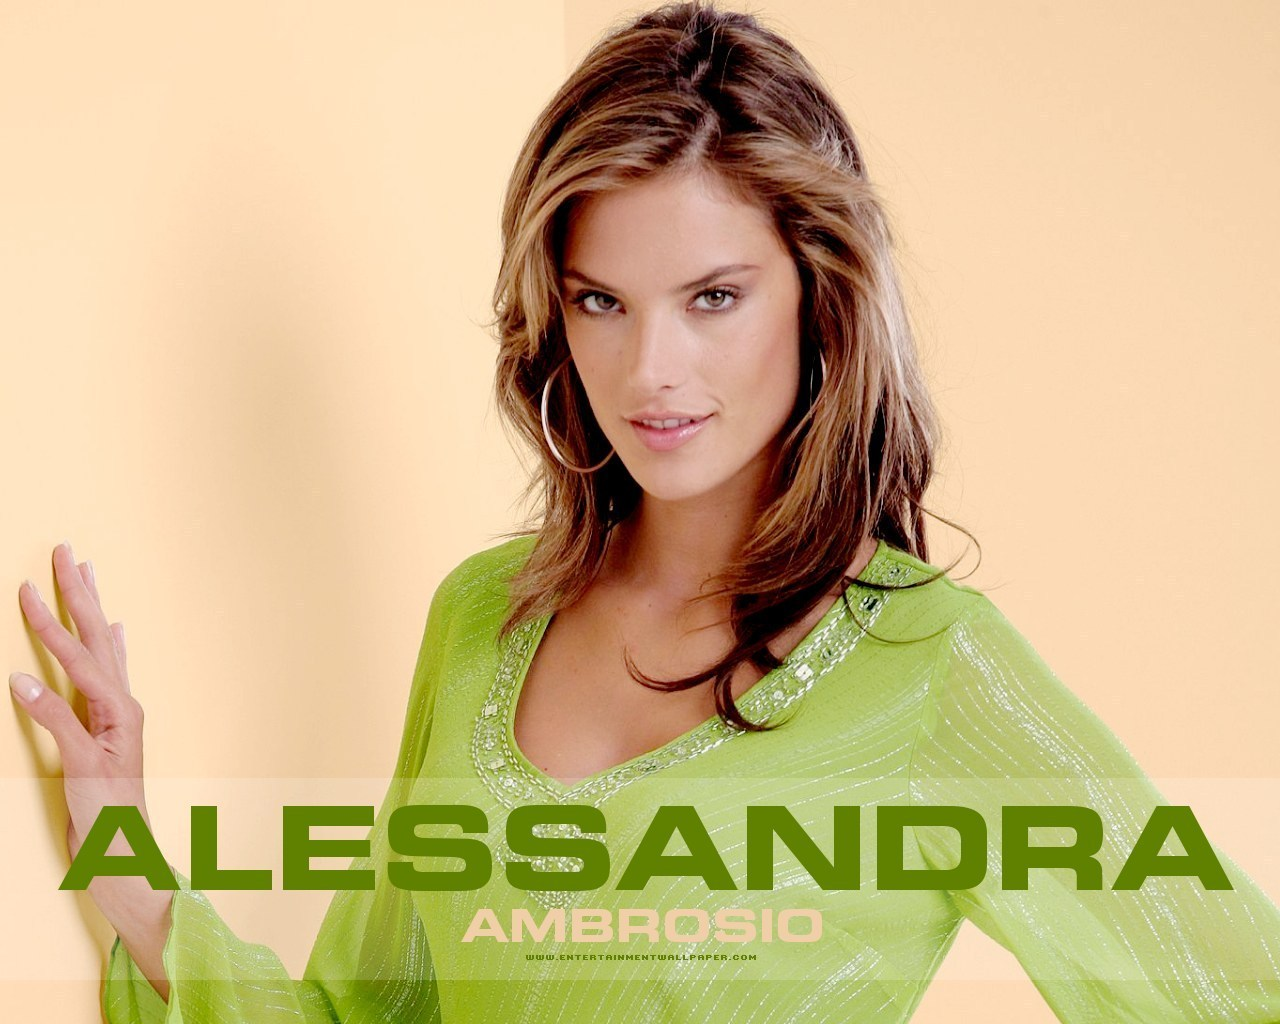 http://4.bp.blogspot.com/-wQ2szxtw_ys/Tw6CTSzOXRI/AAAAAAAACBU/1DmBEvl38Js/s1600/Alessandra-Ambrosio.jpg